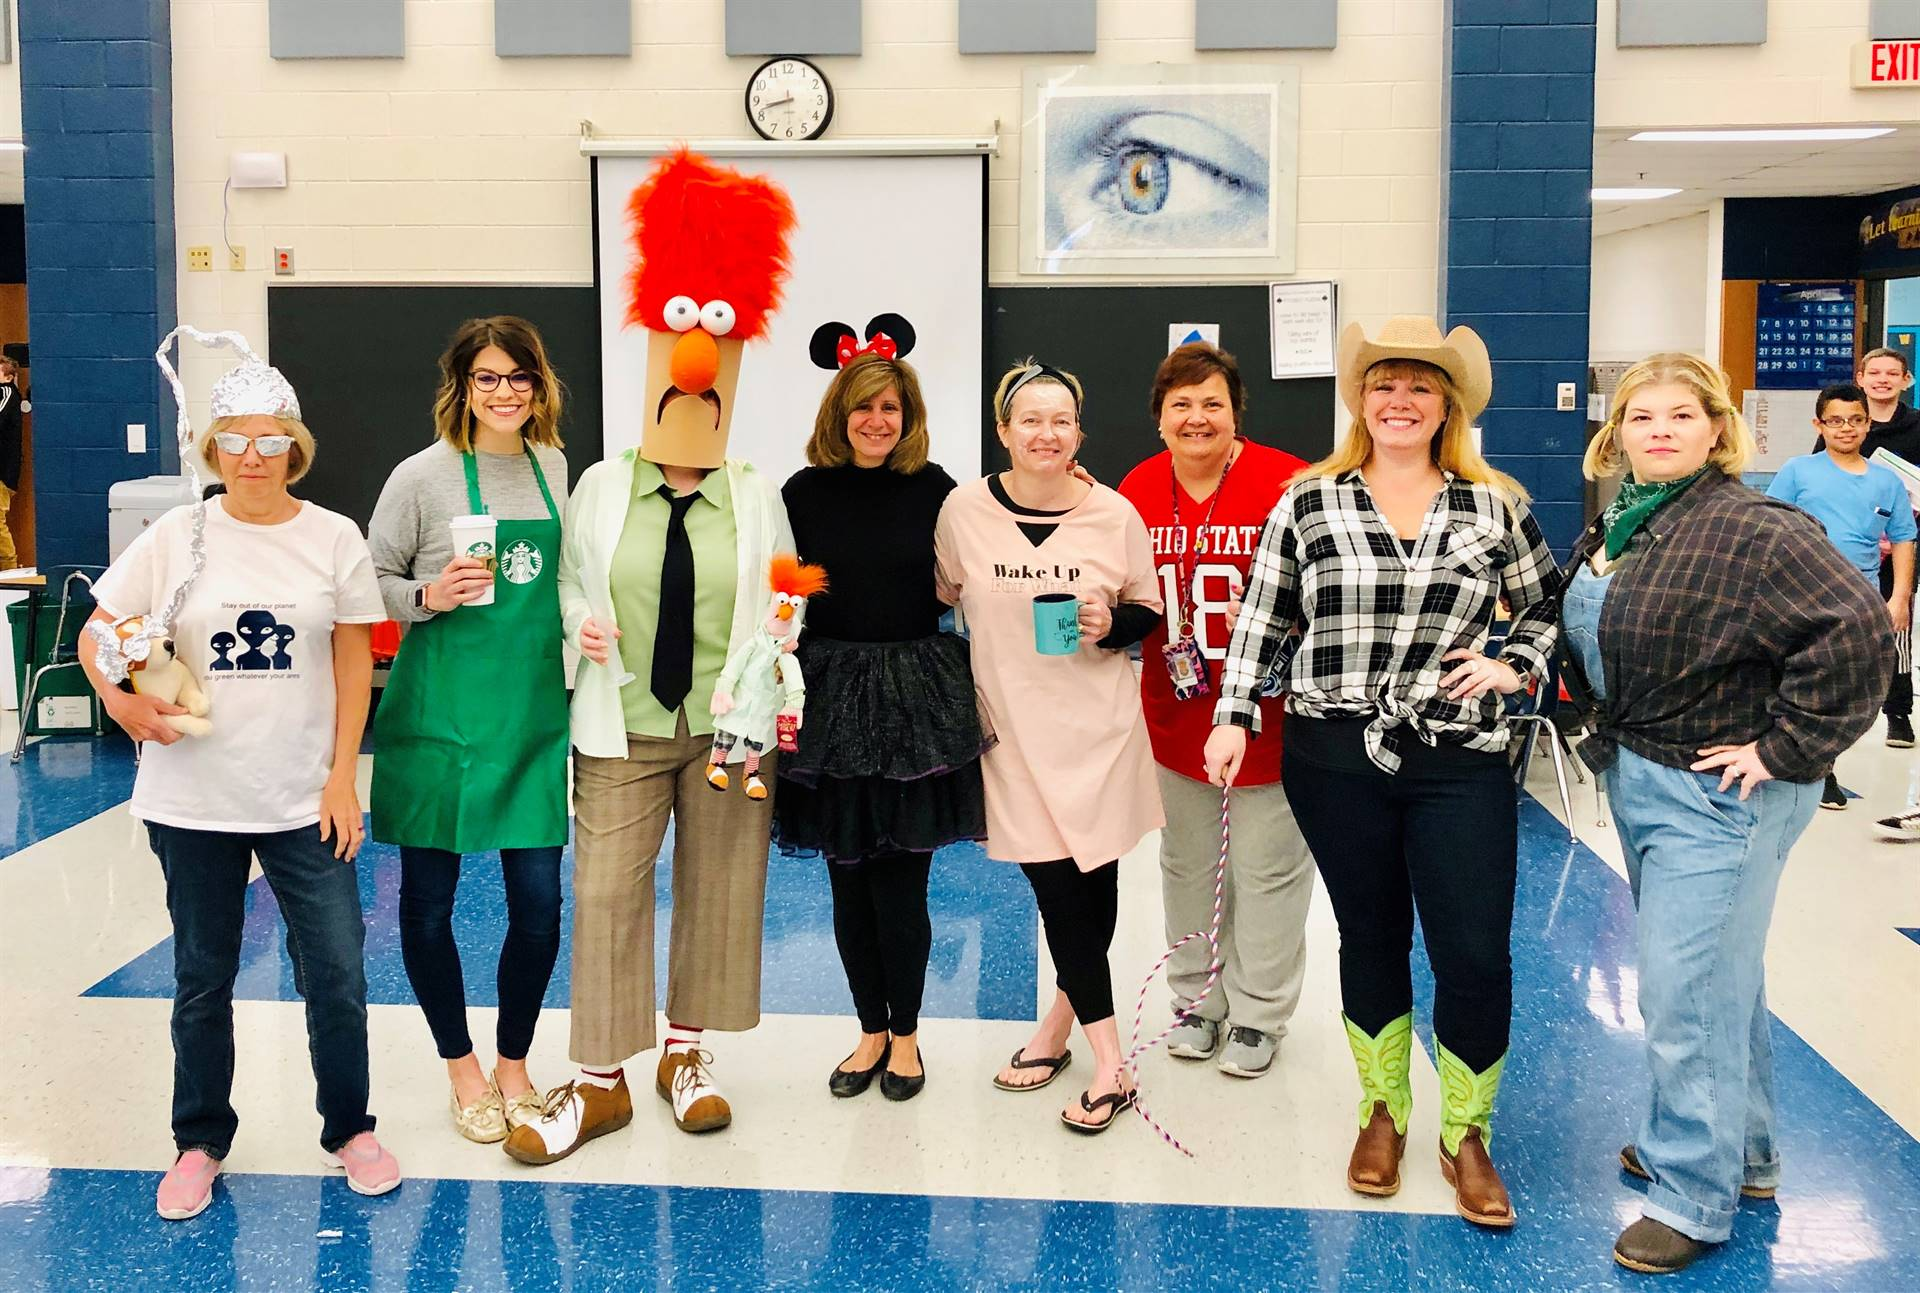 GIS Sixth Grade Staff photo 2019